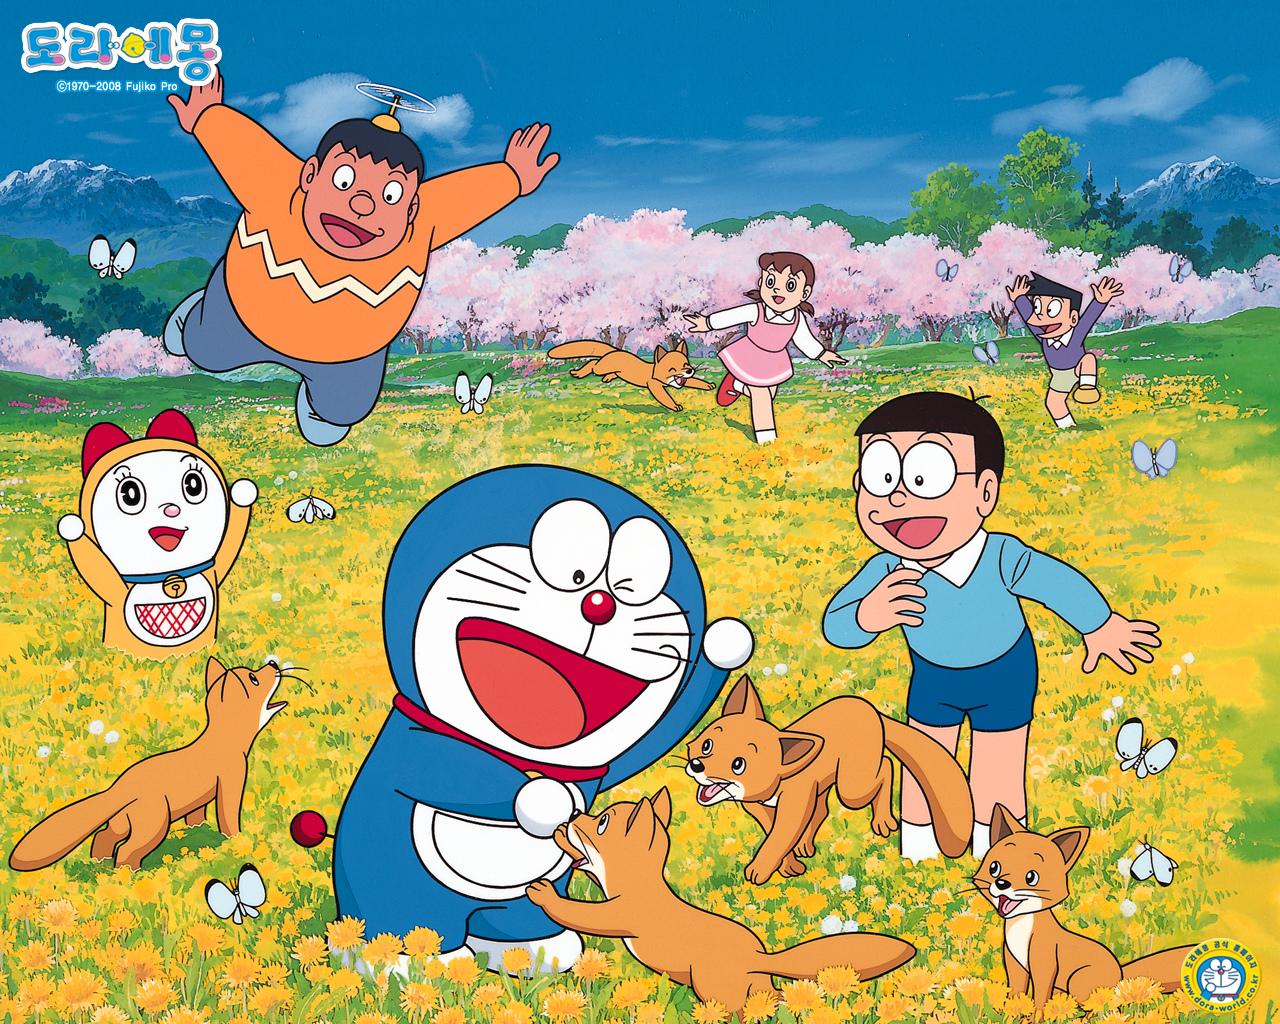 Cute Kitty Wallpapers Apps Fondos De Pantalla De Doraemon Wallpapers Hd Gratis